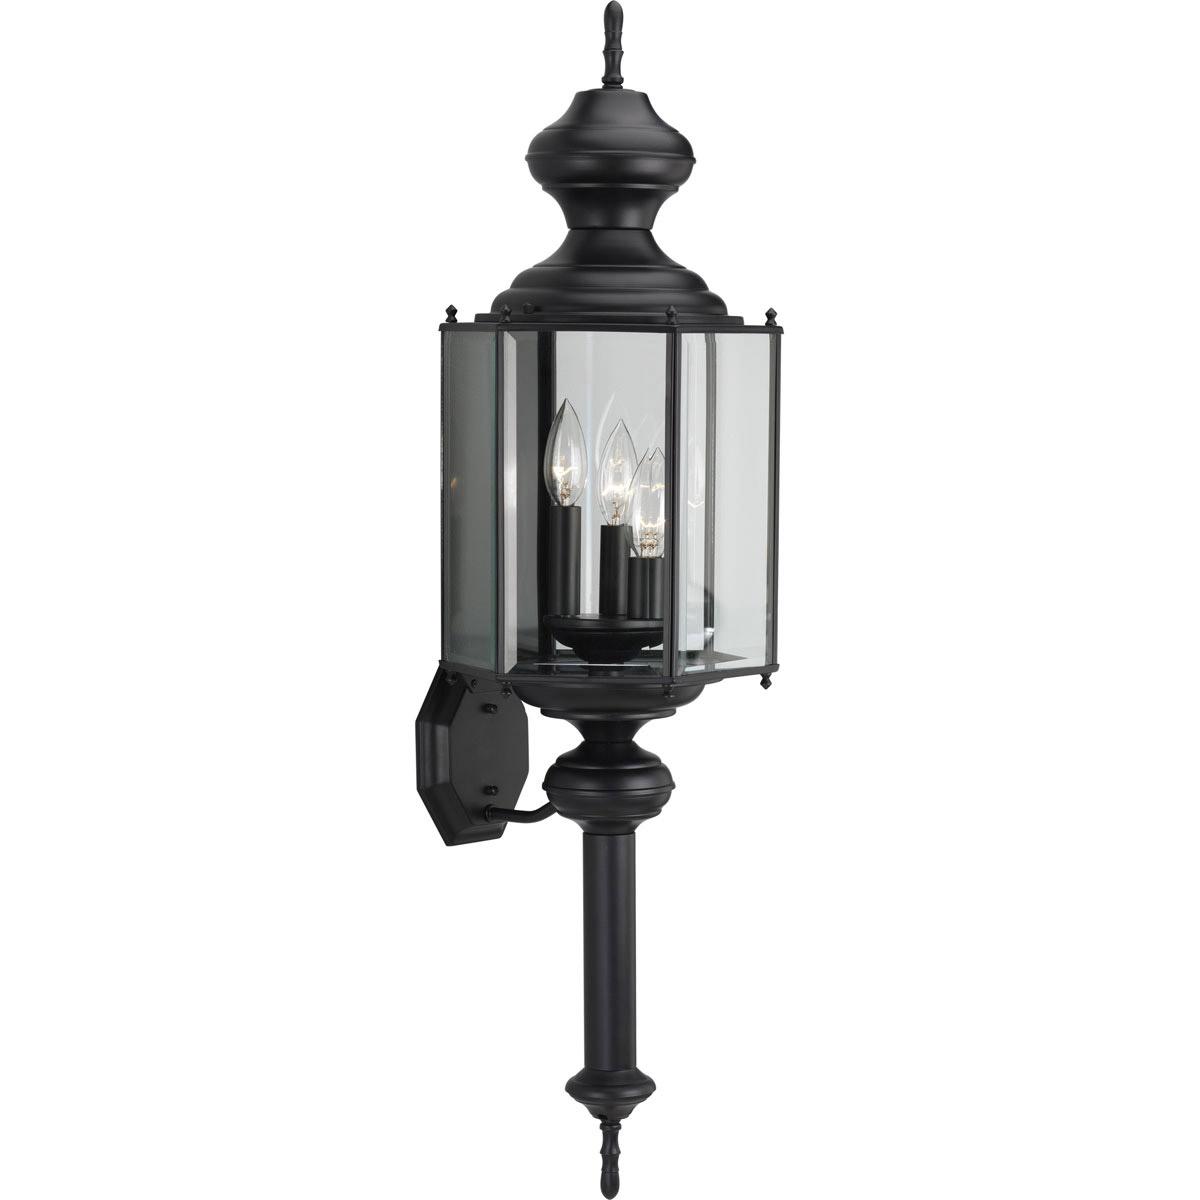 Progress Lighting P5831 31 Brassguard Lantern Outdoor Wall